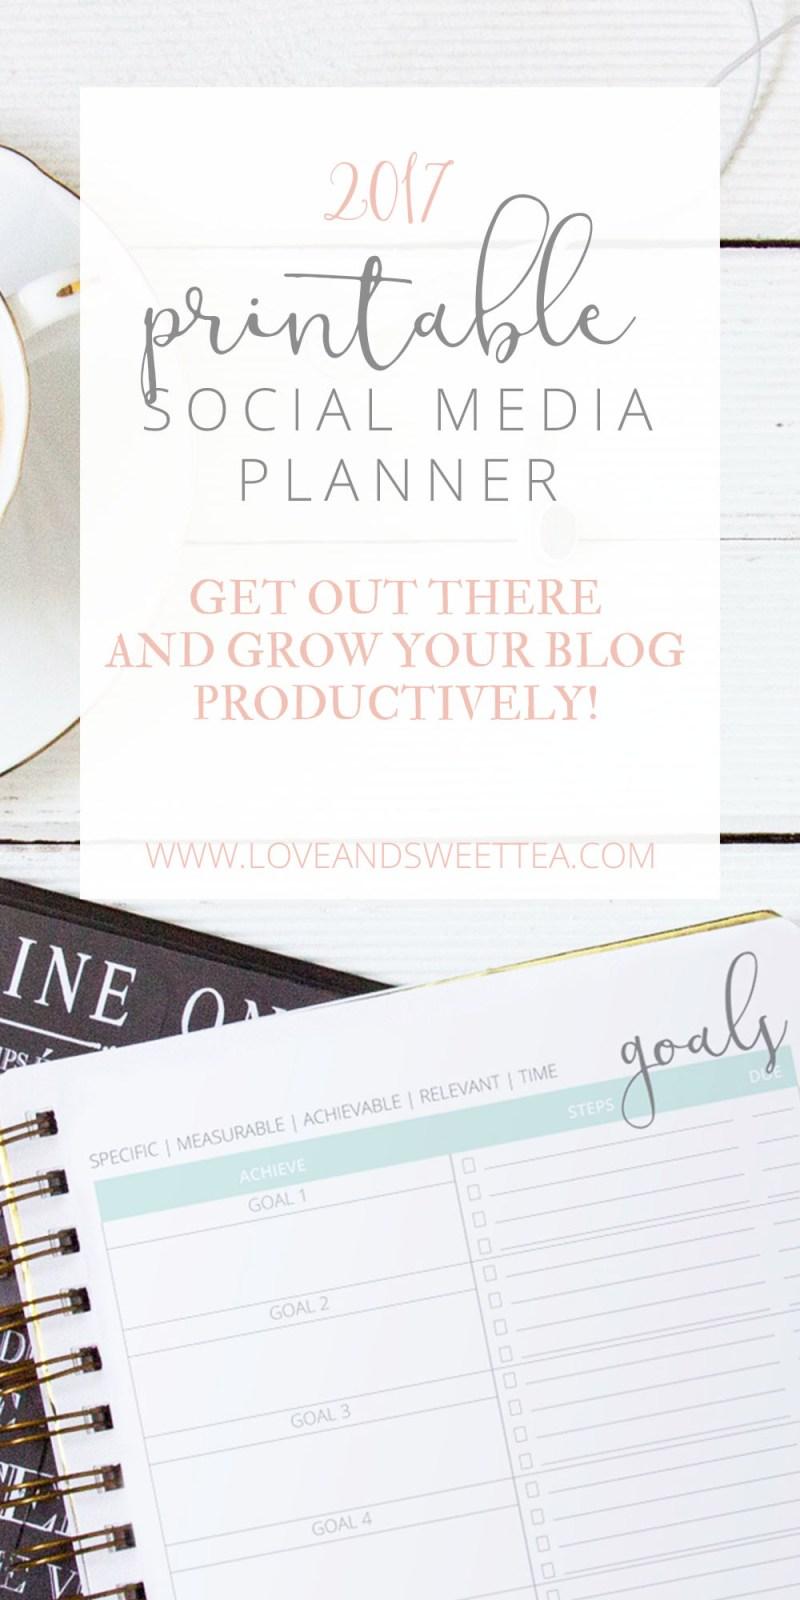 2017 blogging planner, printable planner for bloggers, printable planner, planner printable